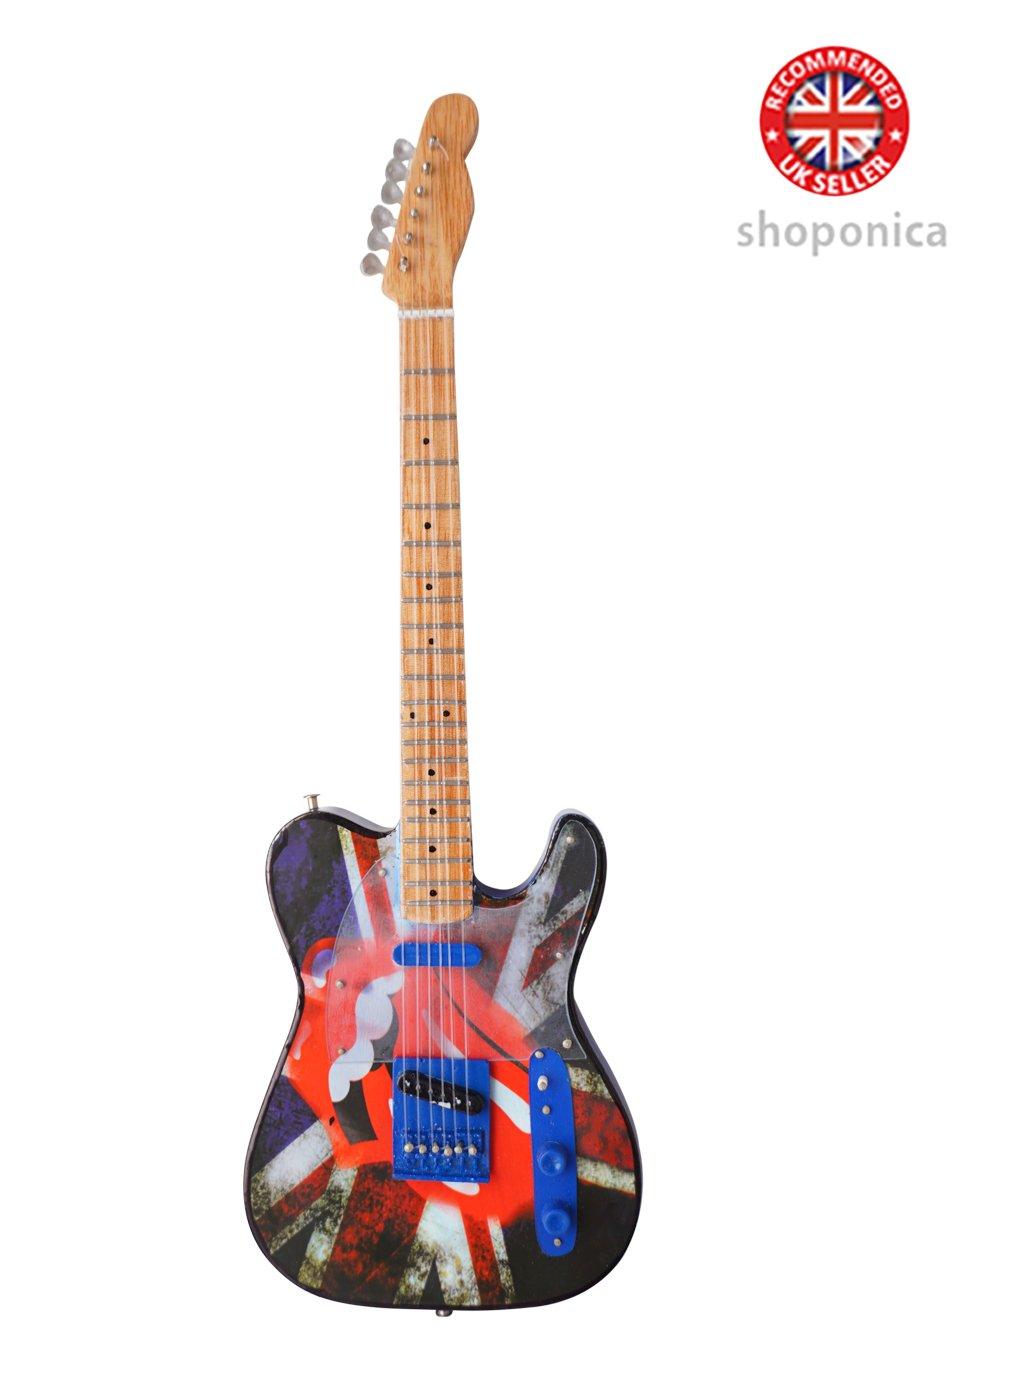 Miniatur-Gitarre aus Holz, Design: Rolling Stones, Nachbildung Music Legends